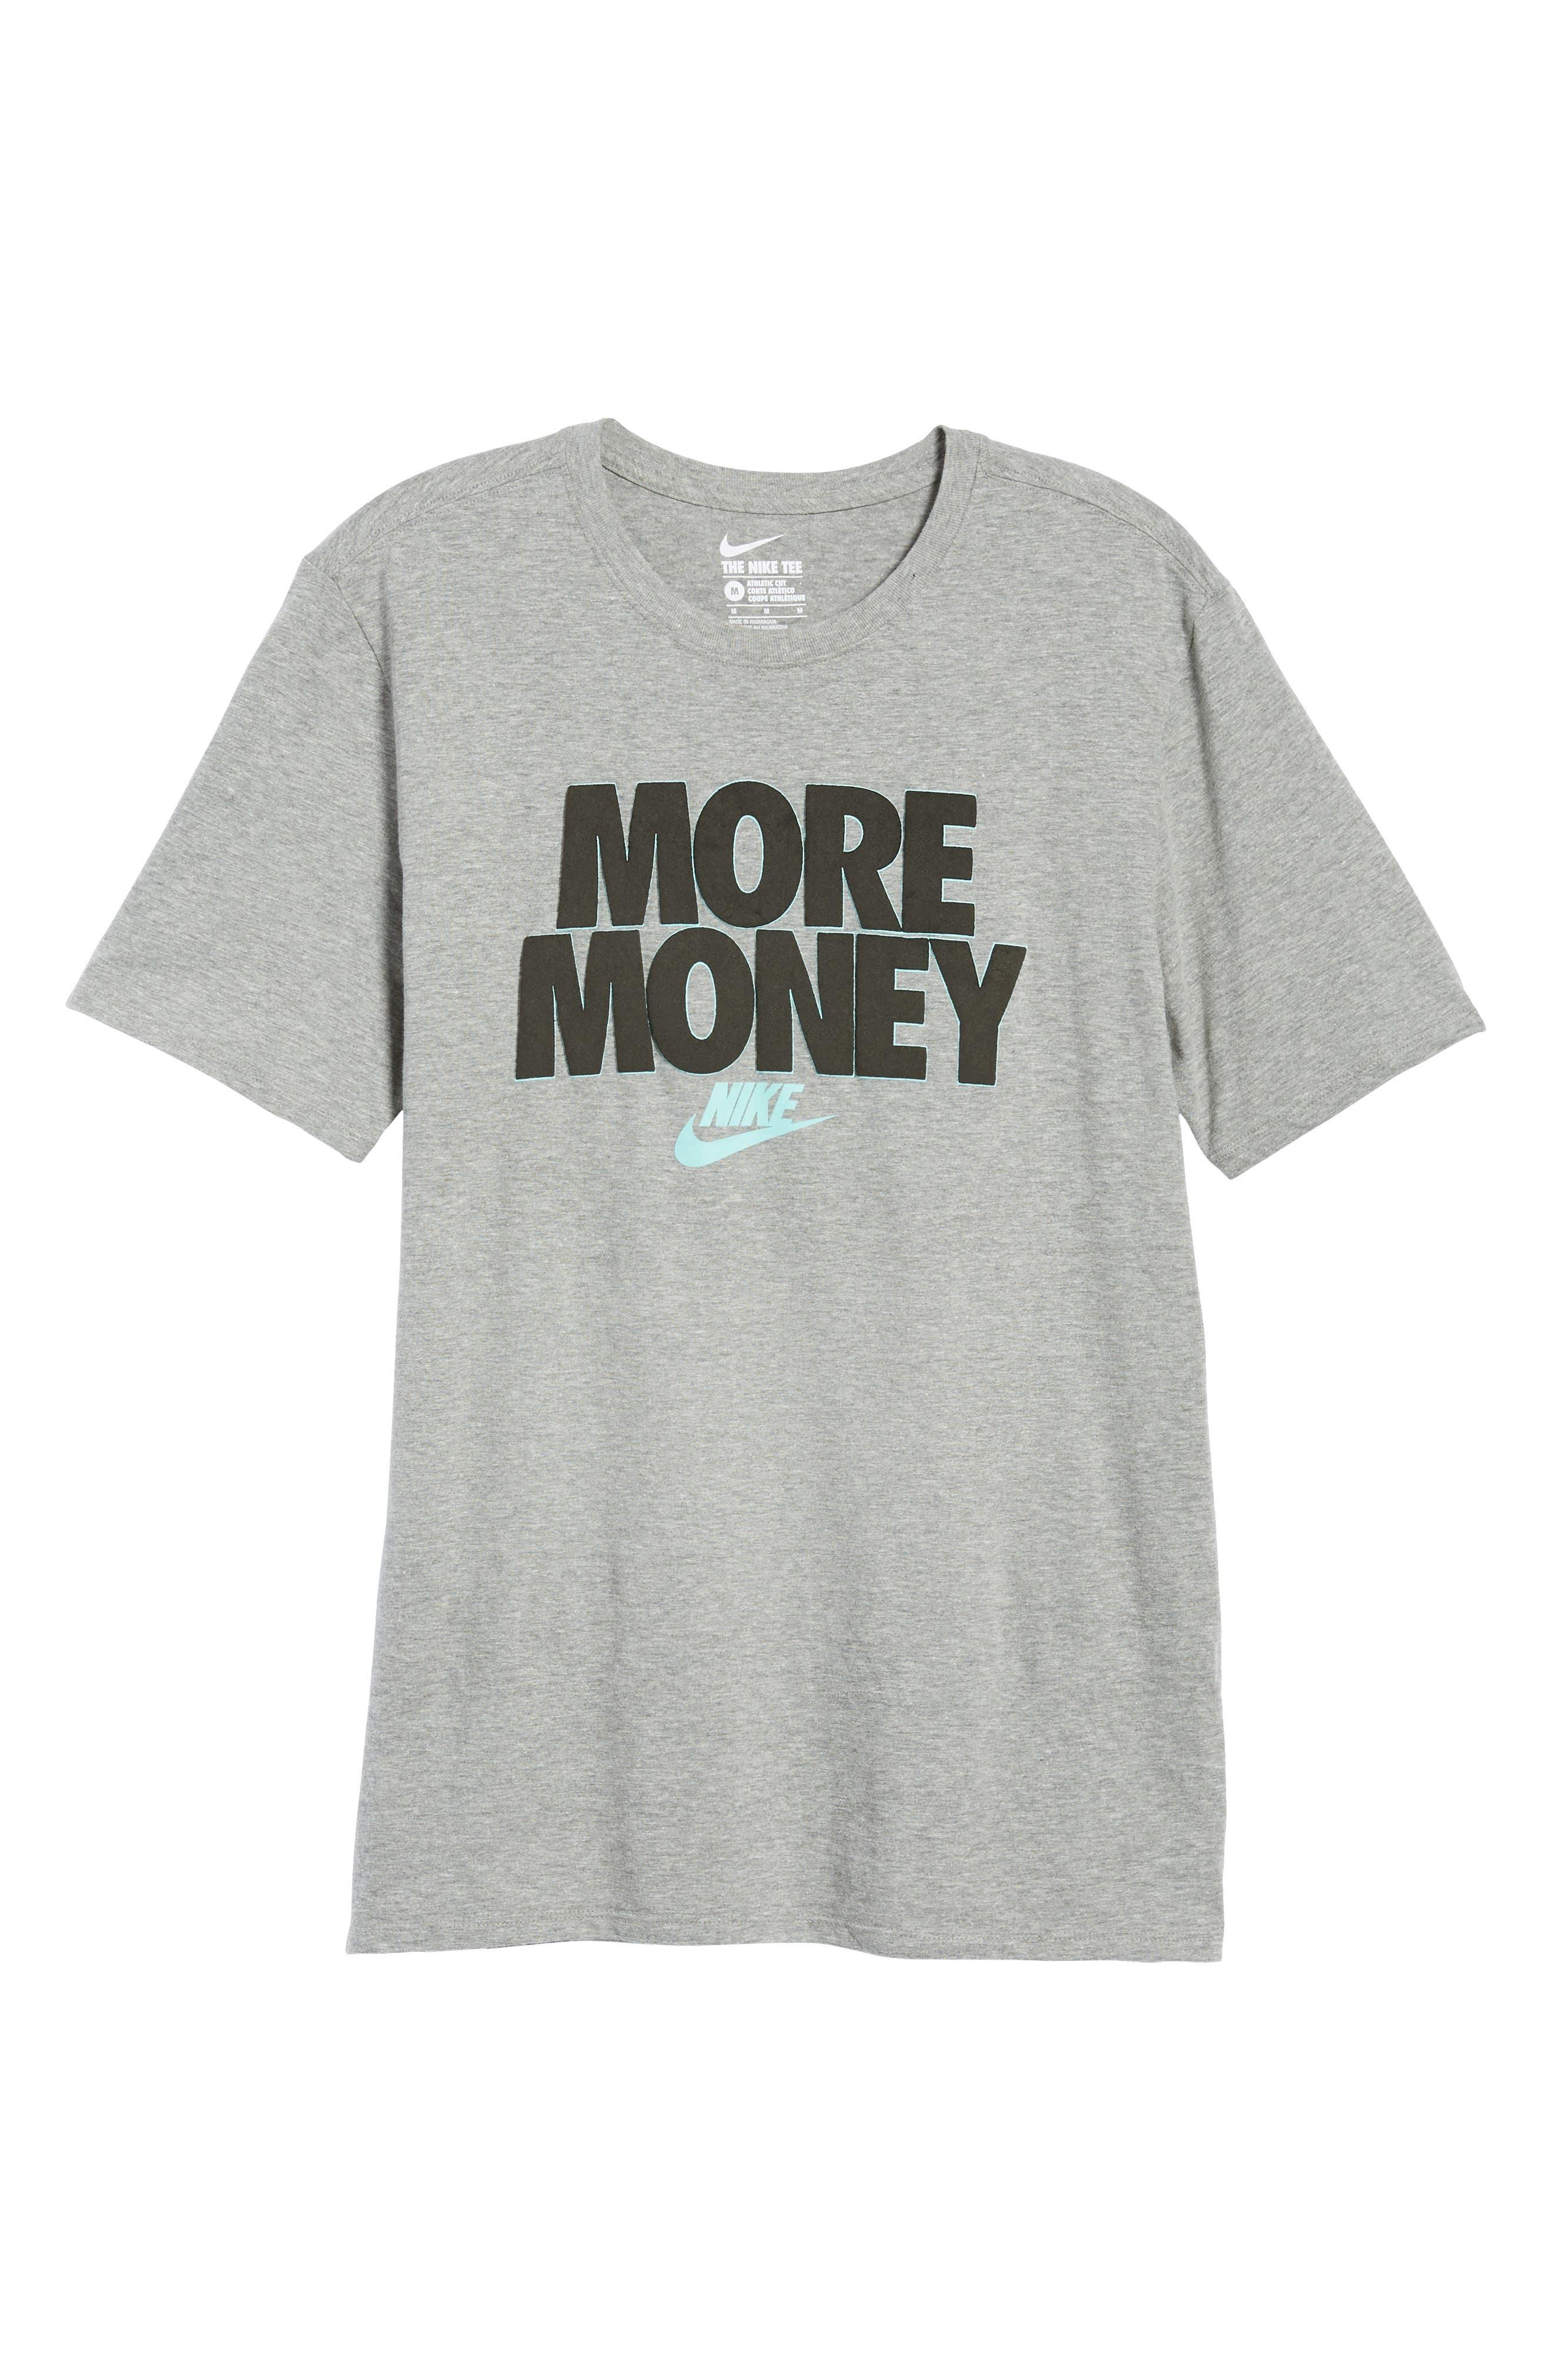 Sportswear More Money T-Shirt,                             Alternate thumbnail 6, color,                             DK GREY HEATHER/ BLACK